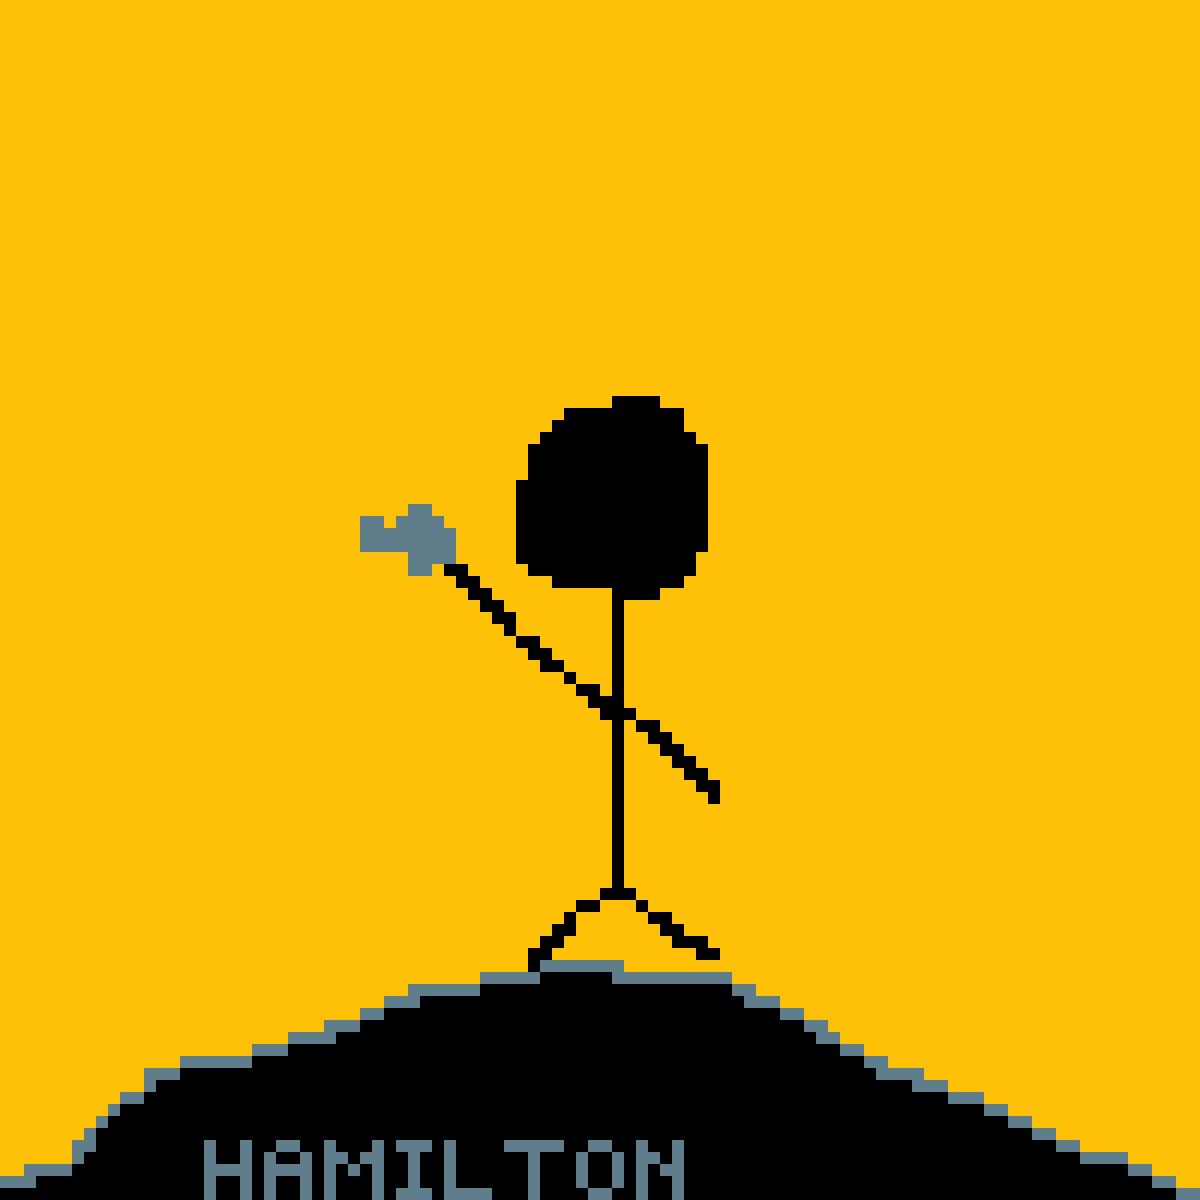 hamilton by Swan